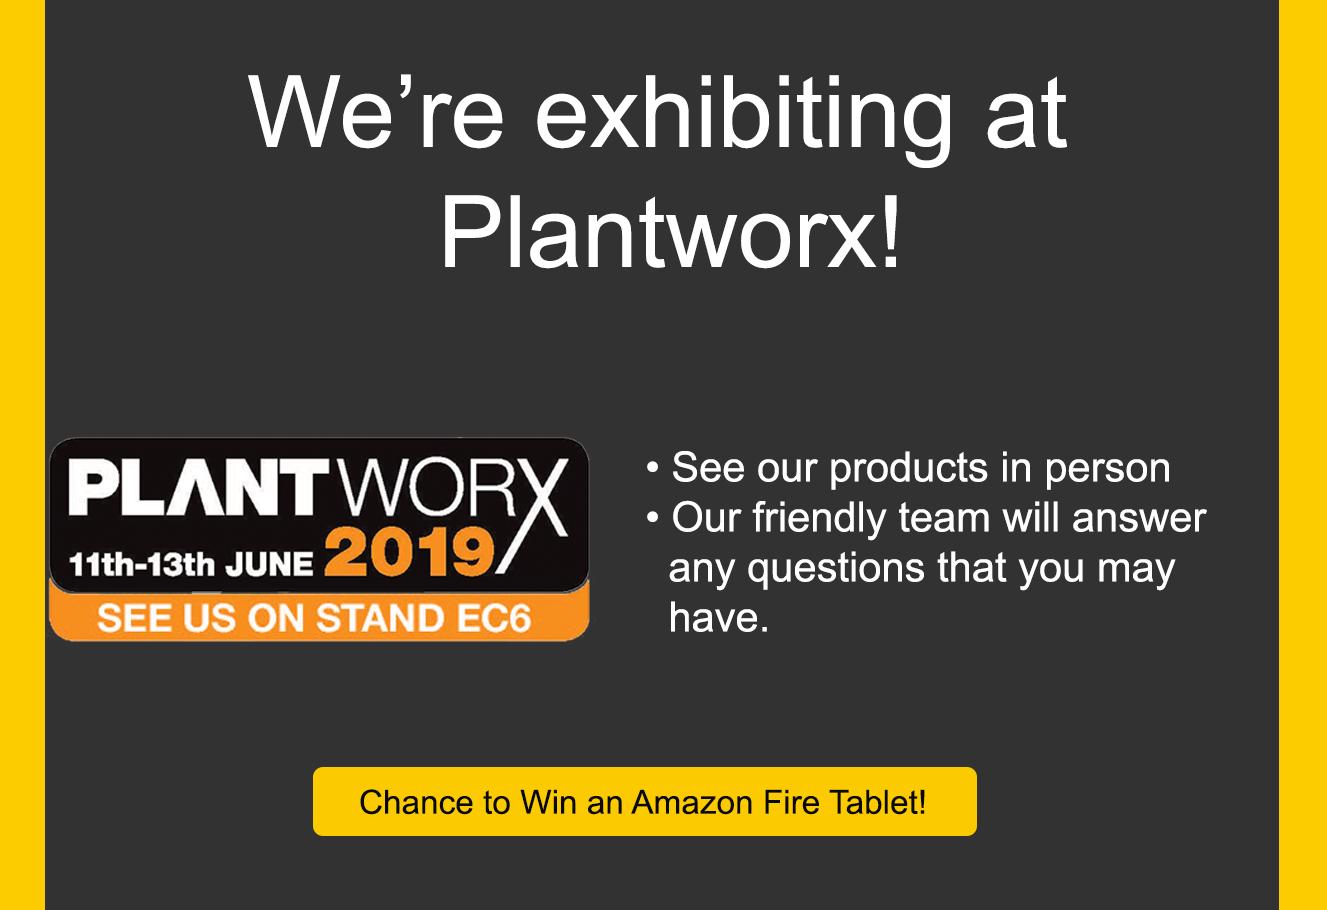 plantworx-cover